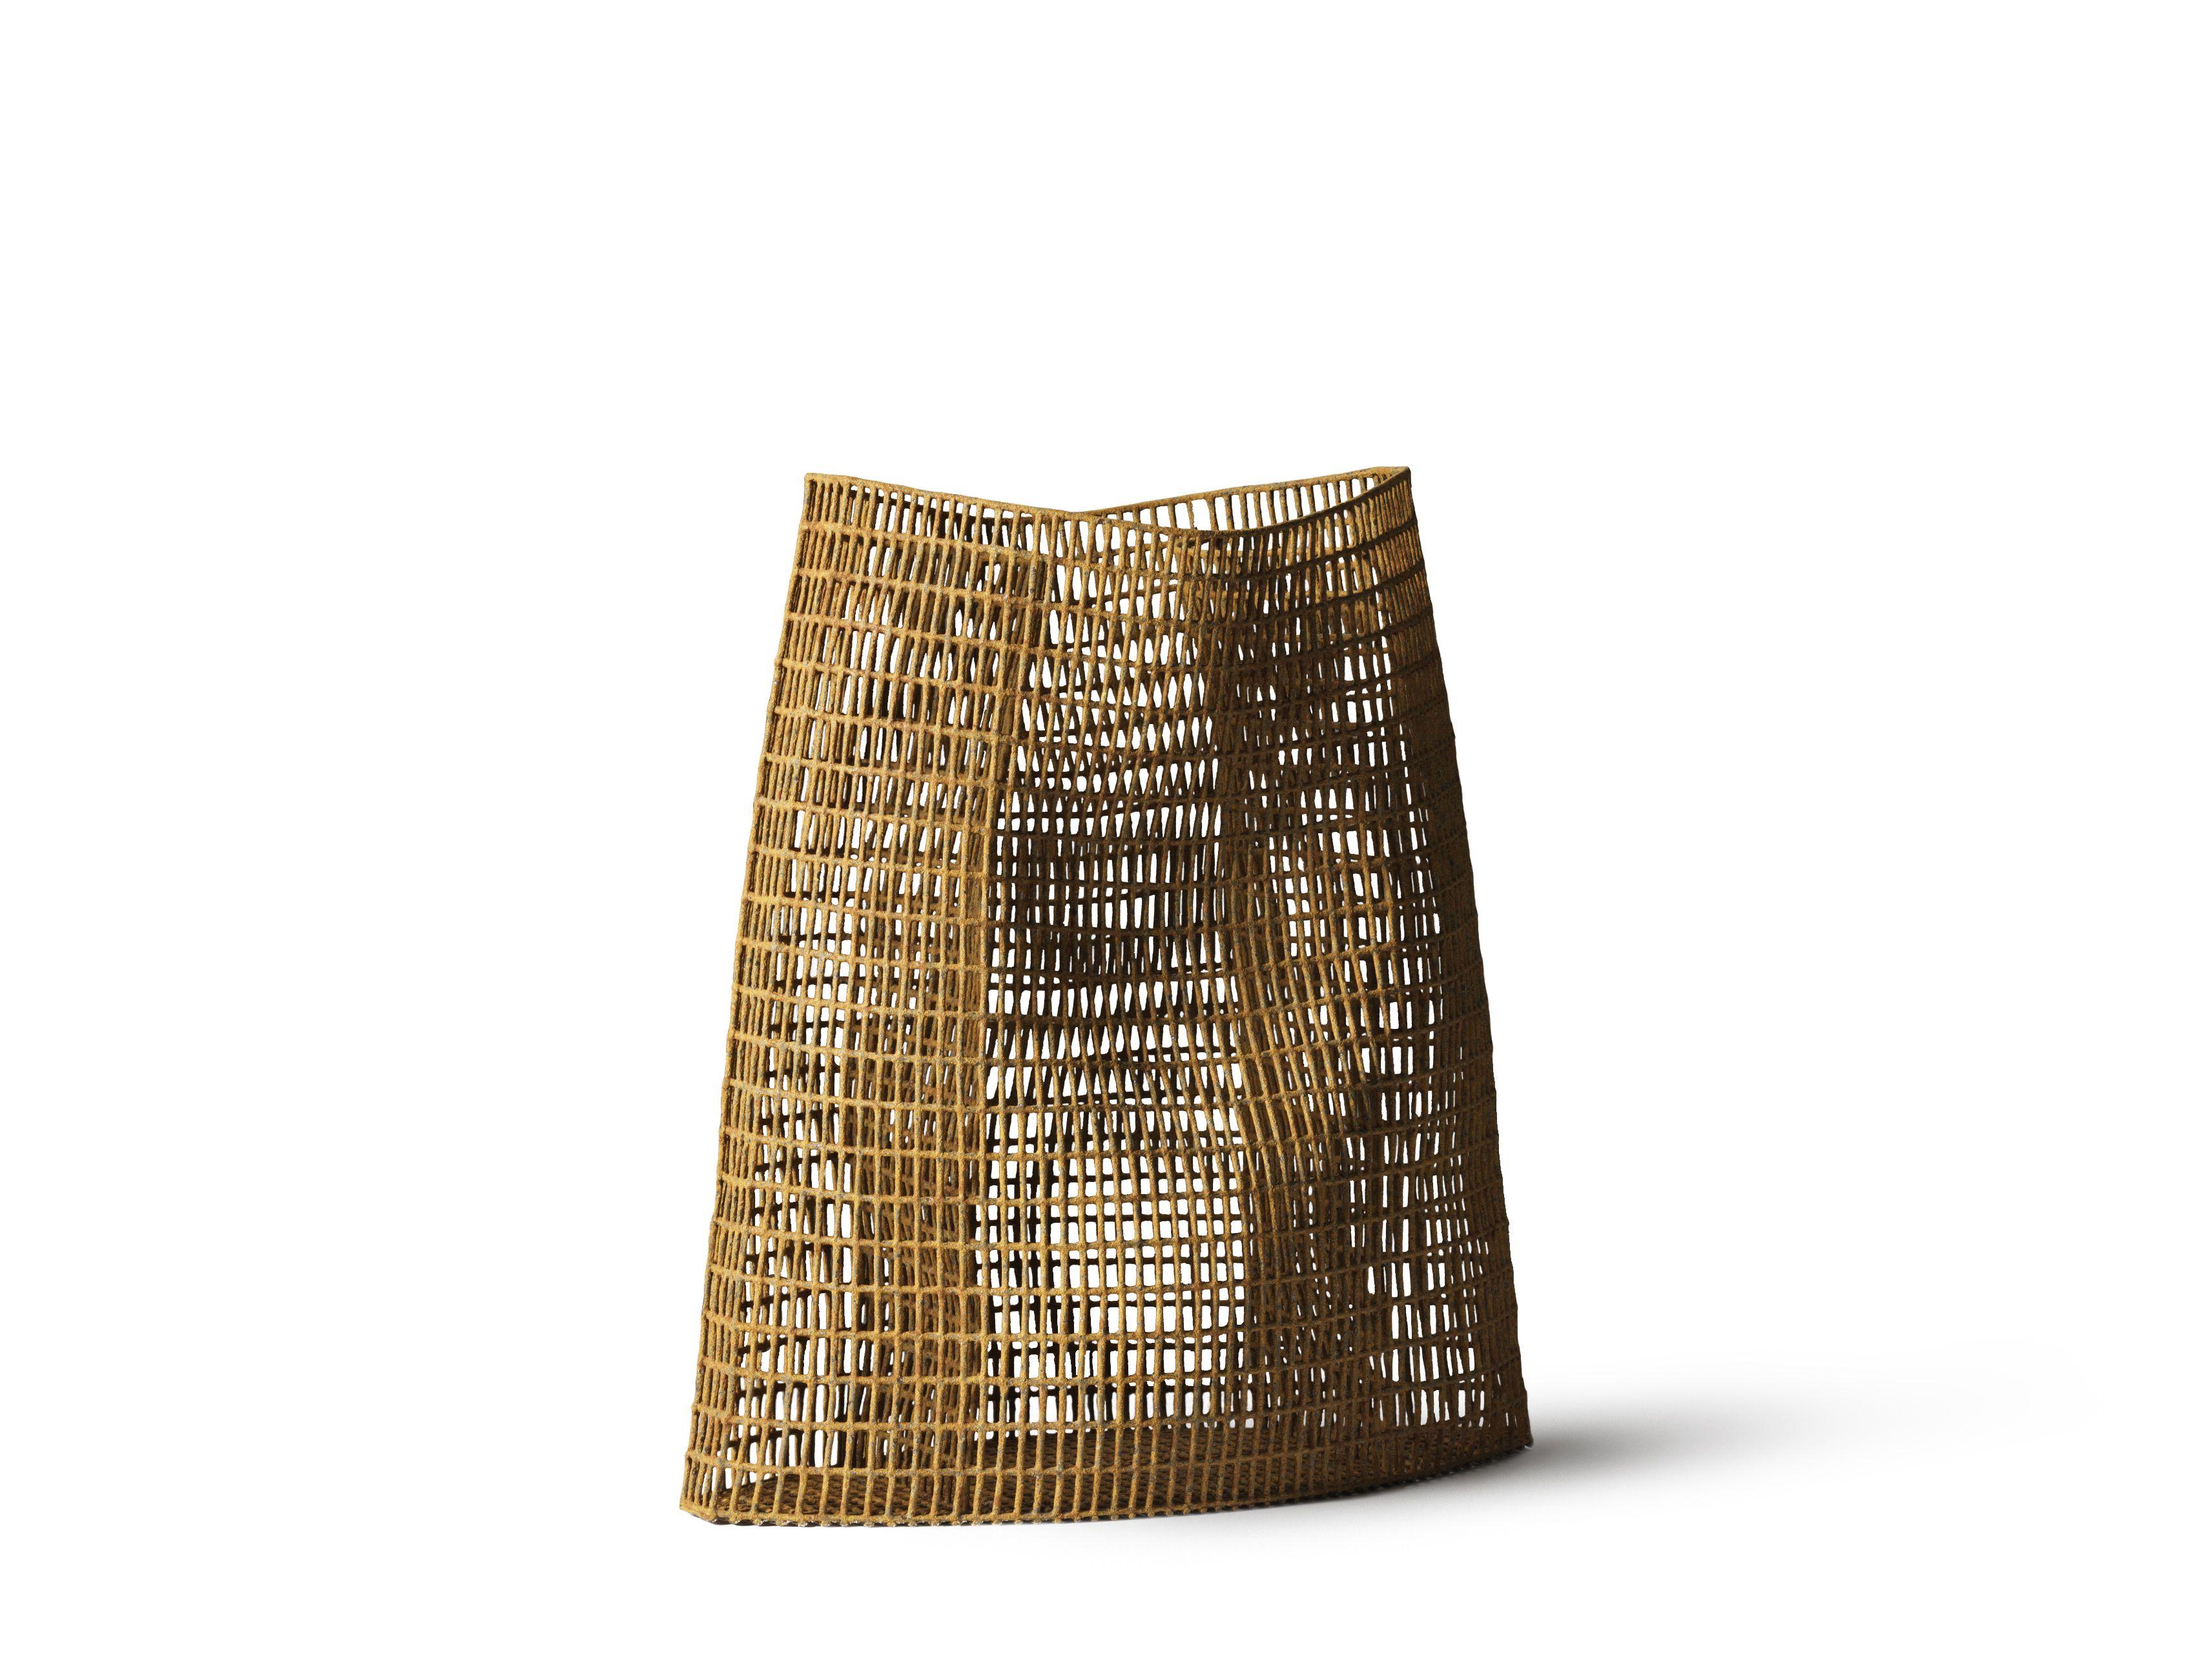 FinalistasLoewe Craft Prize 2019